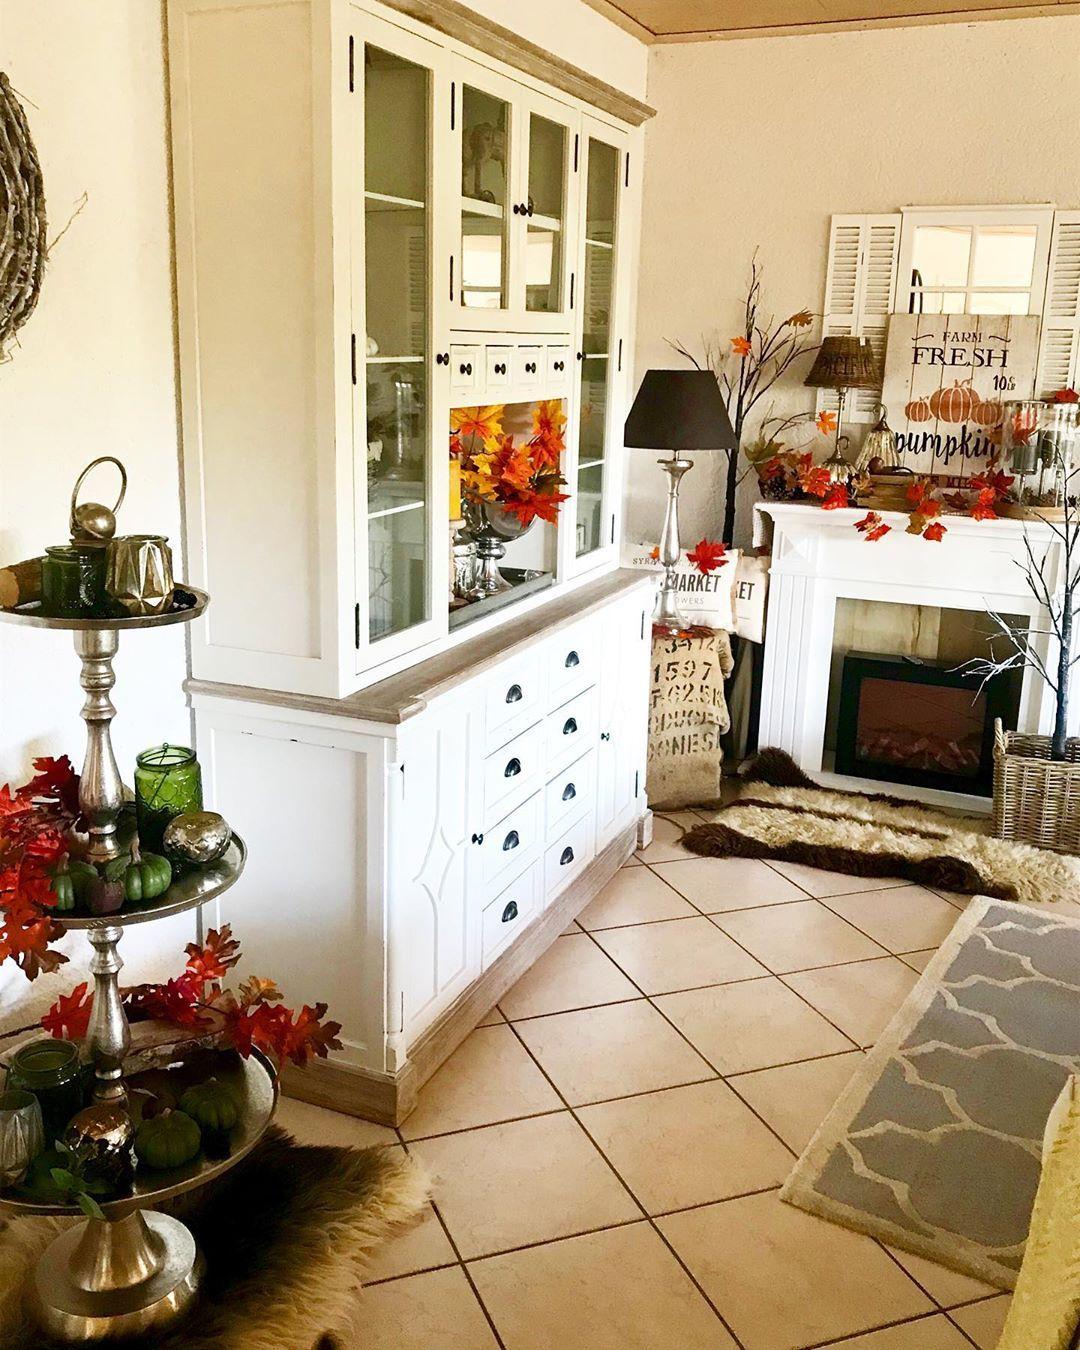 Farmhousehome Decorating Ideas:  Ideas 4 Our House